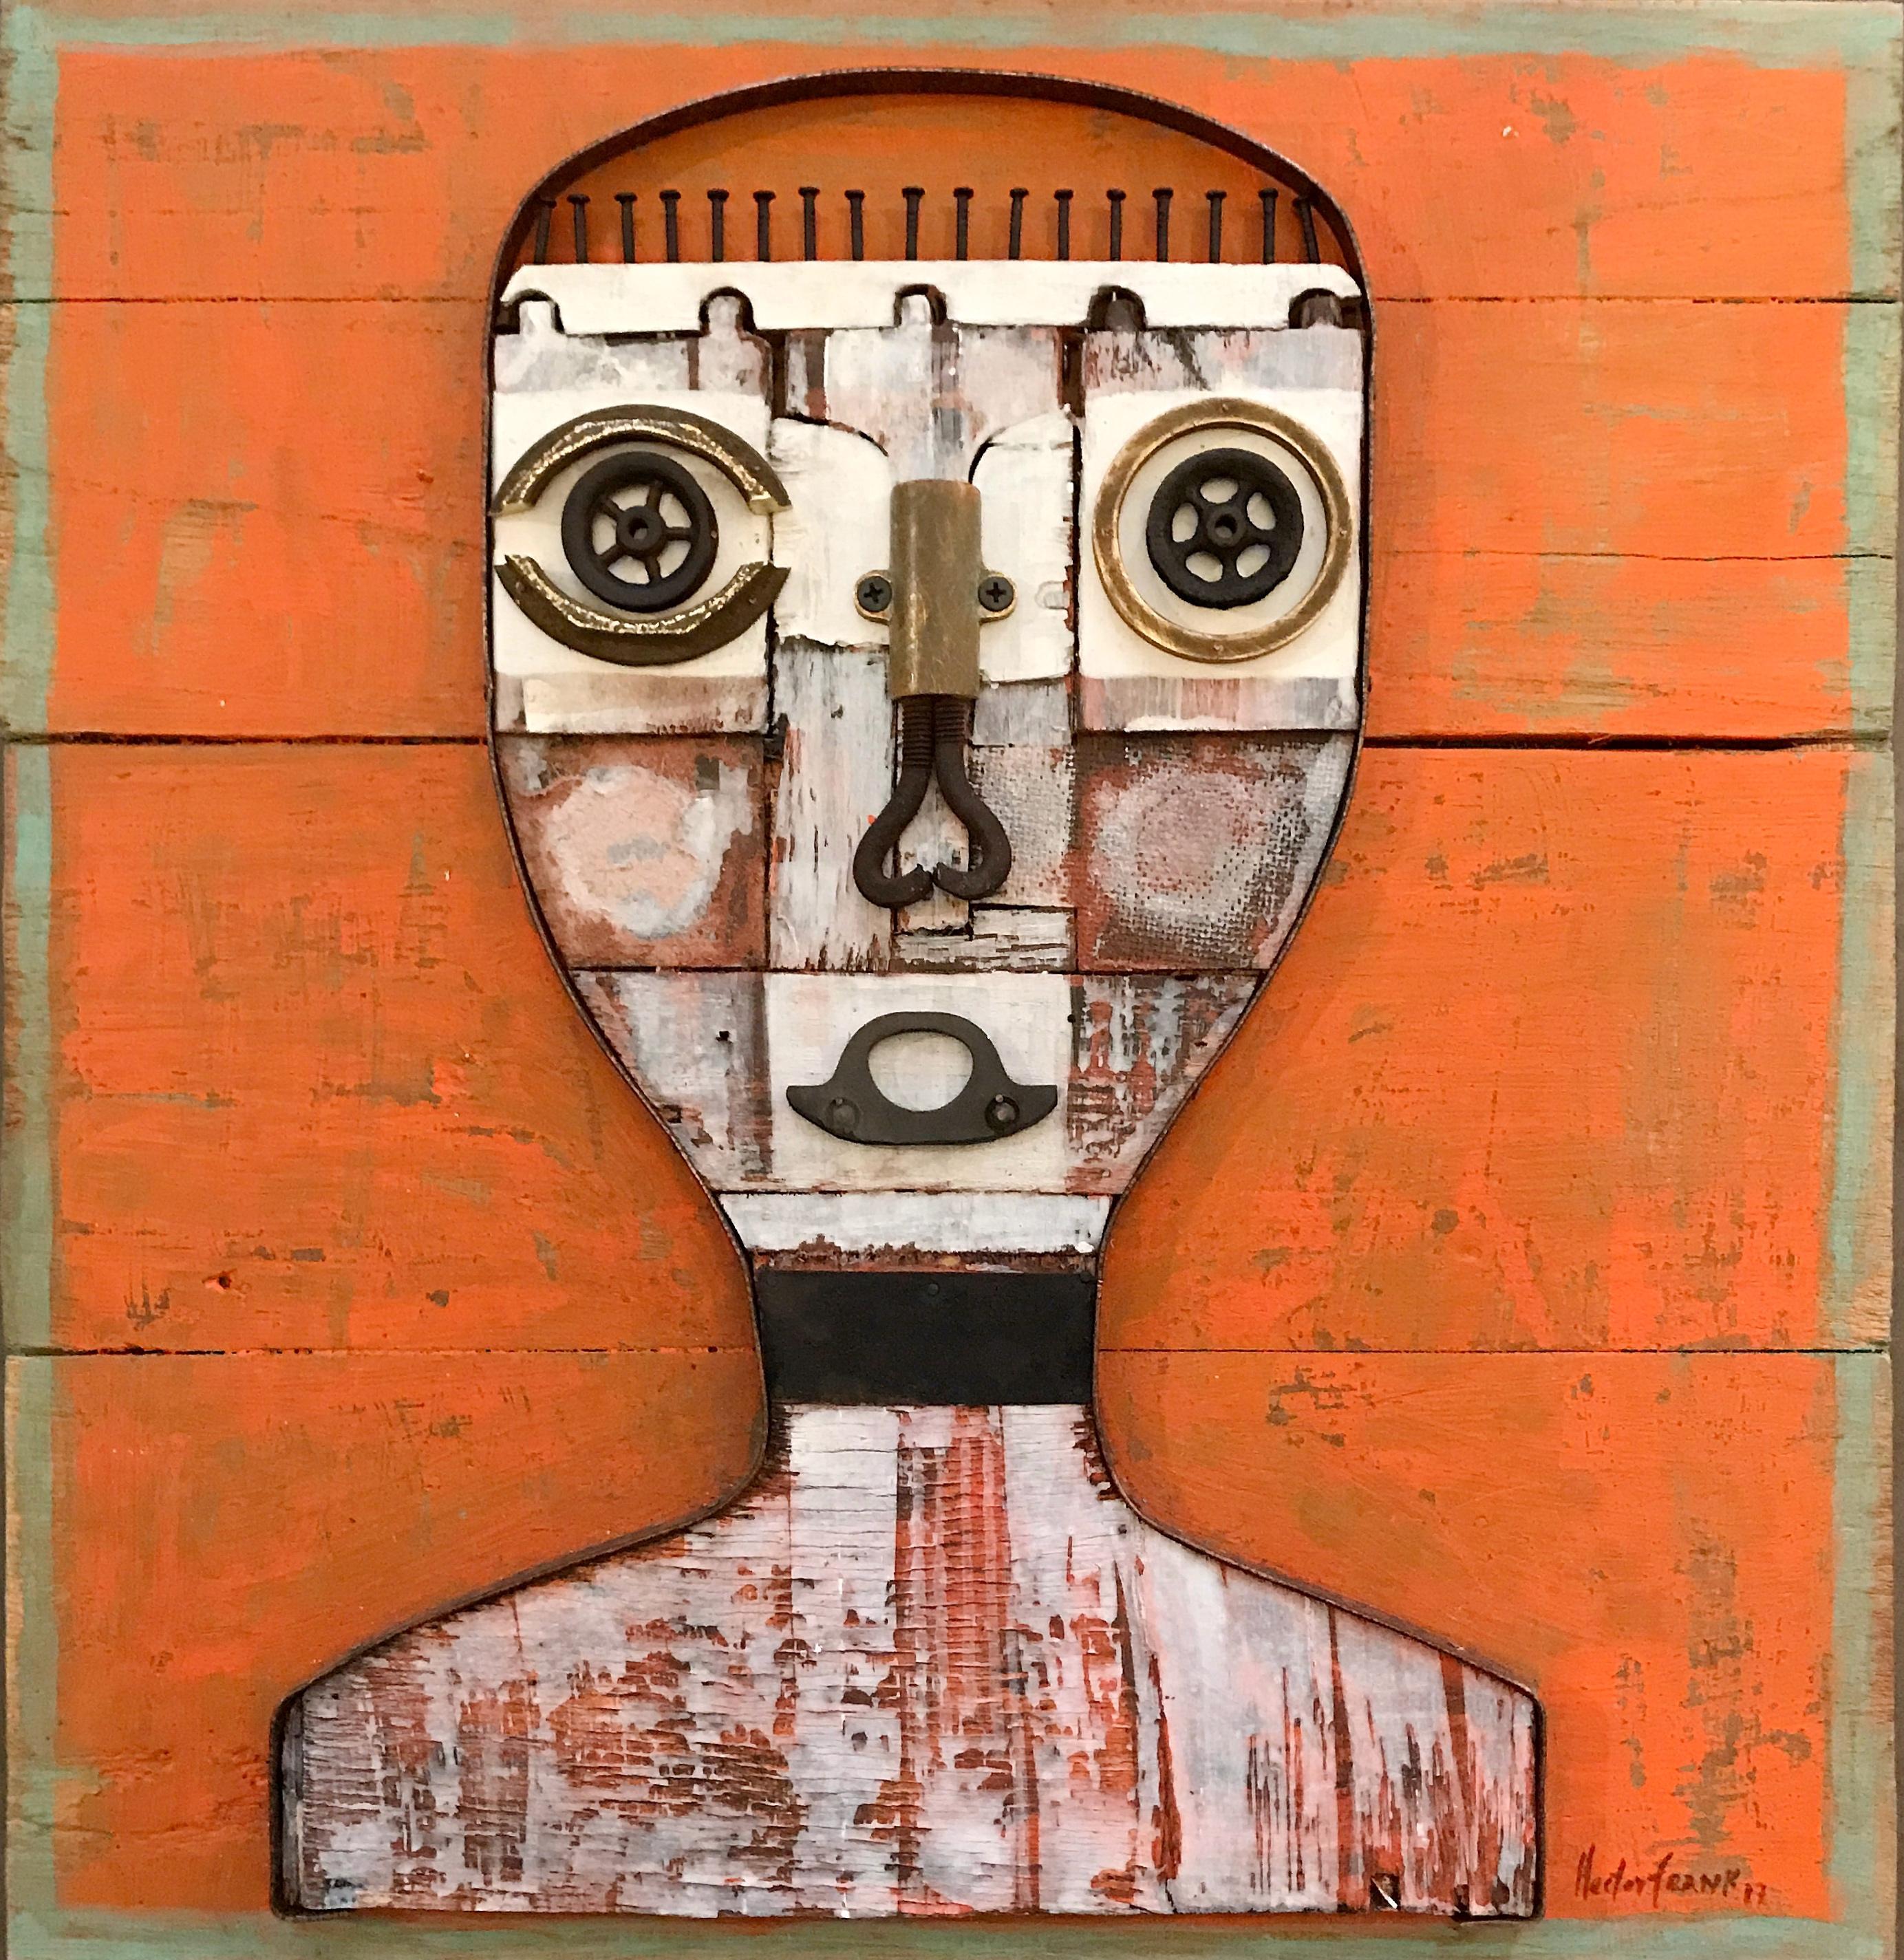 Hector Frank, Untitled Cuban Textured Orange Wood Portrait